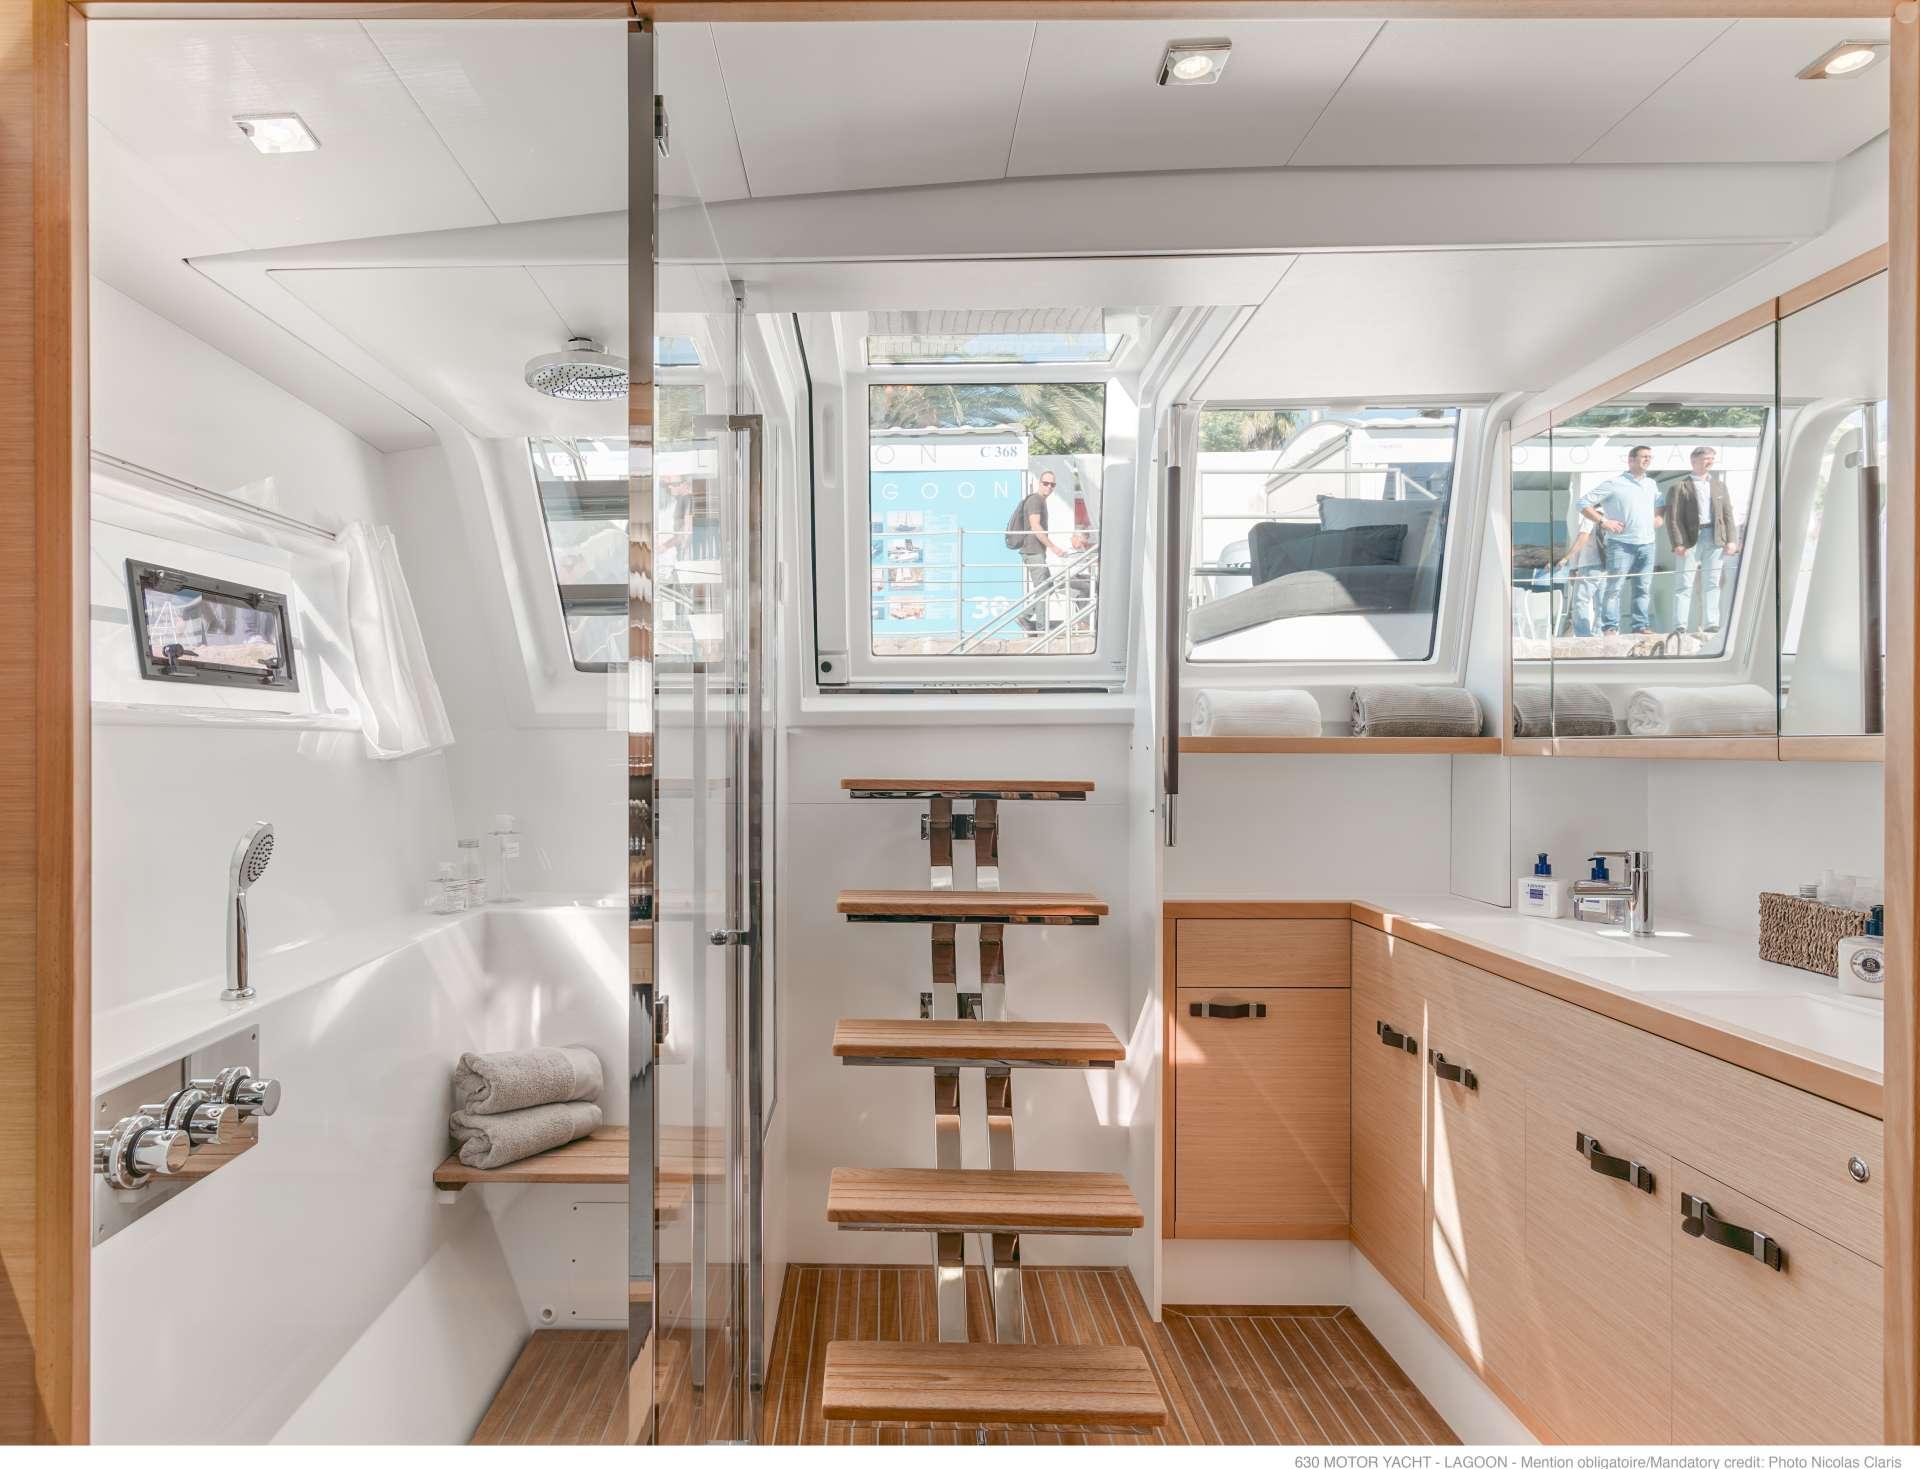 PLAYTIME 630 yacht image # 9